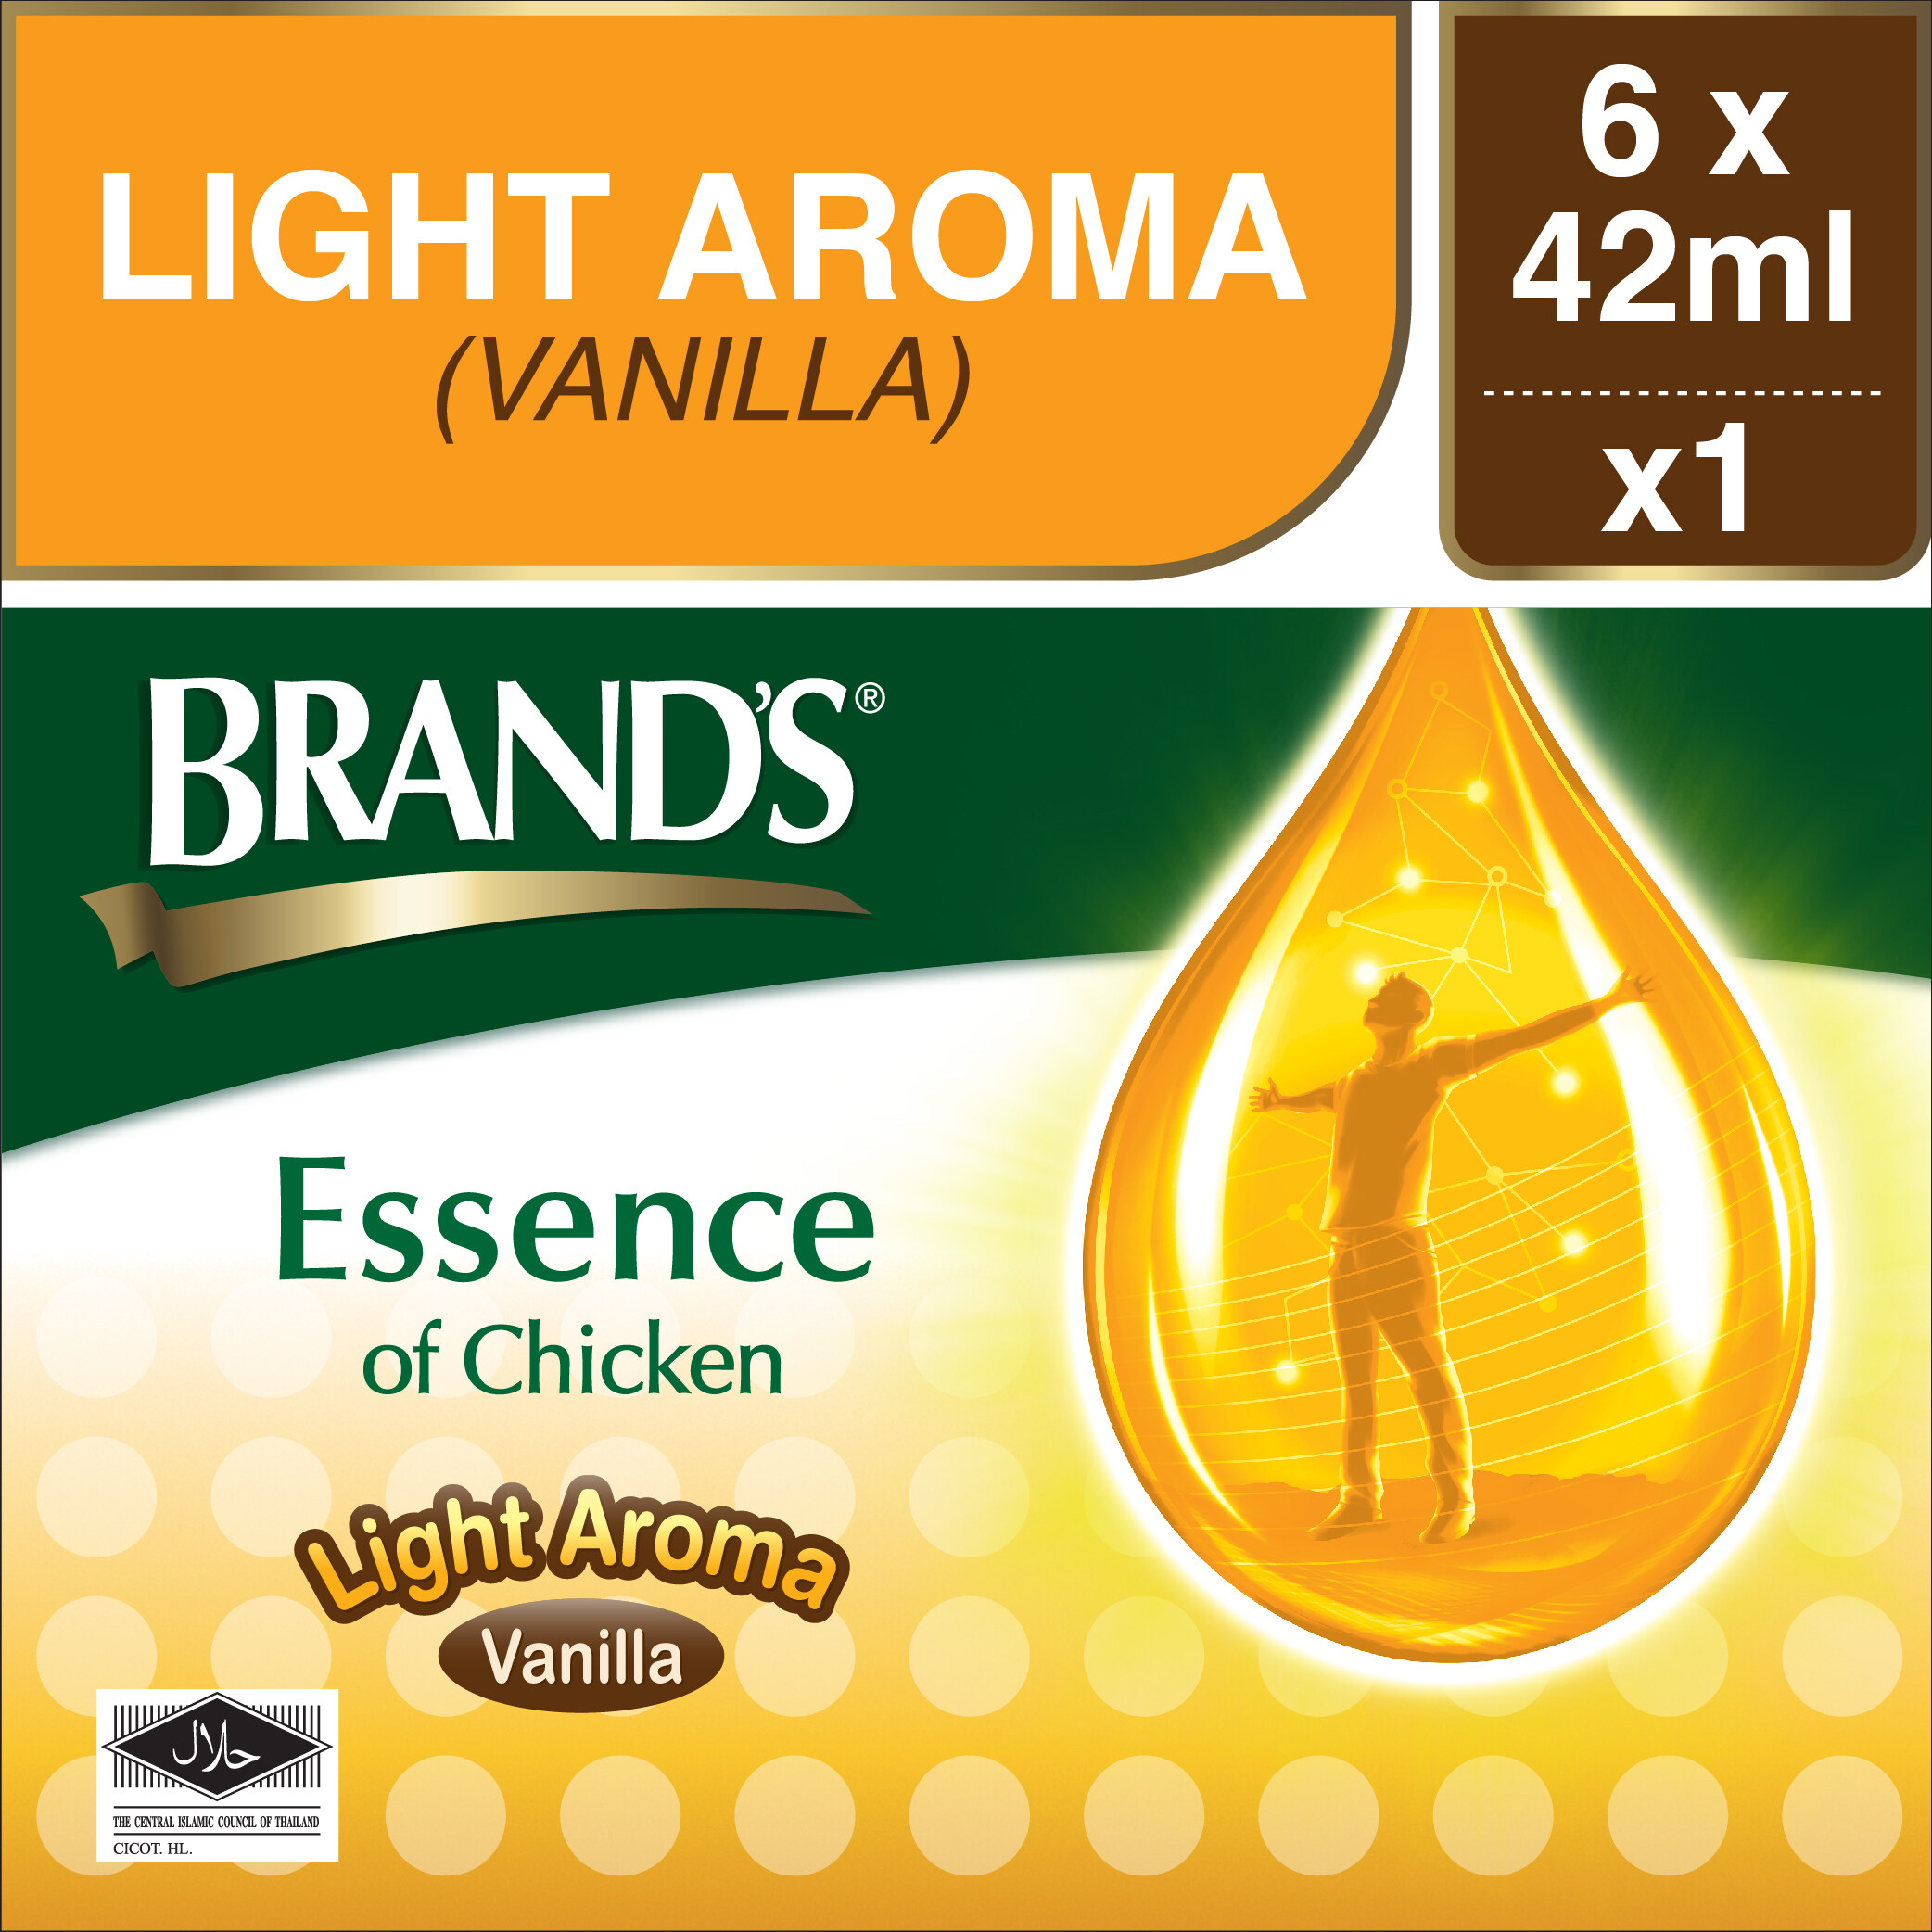 Brand's Essence of Chicken Light Aroma (6 bottles x 42gr)